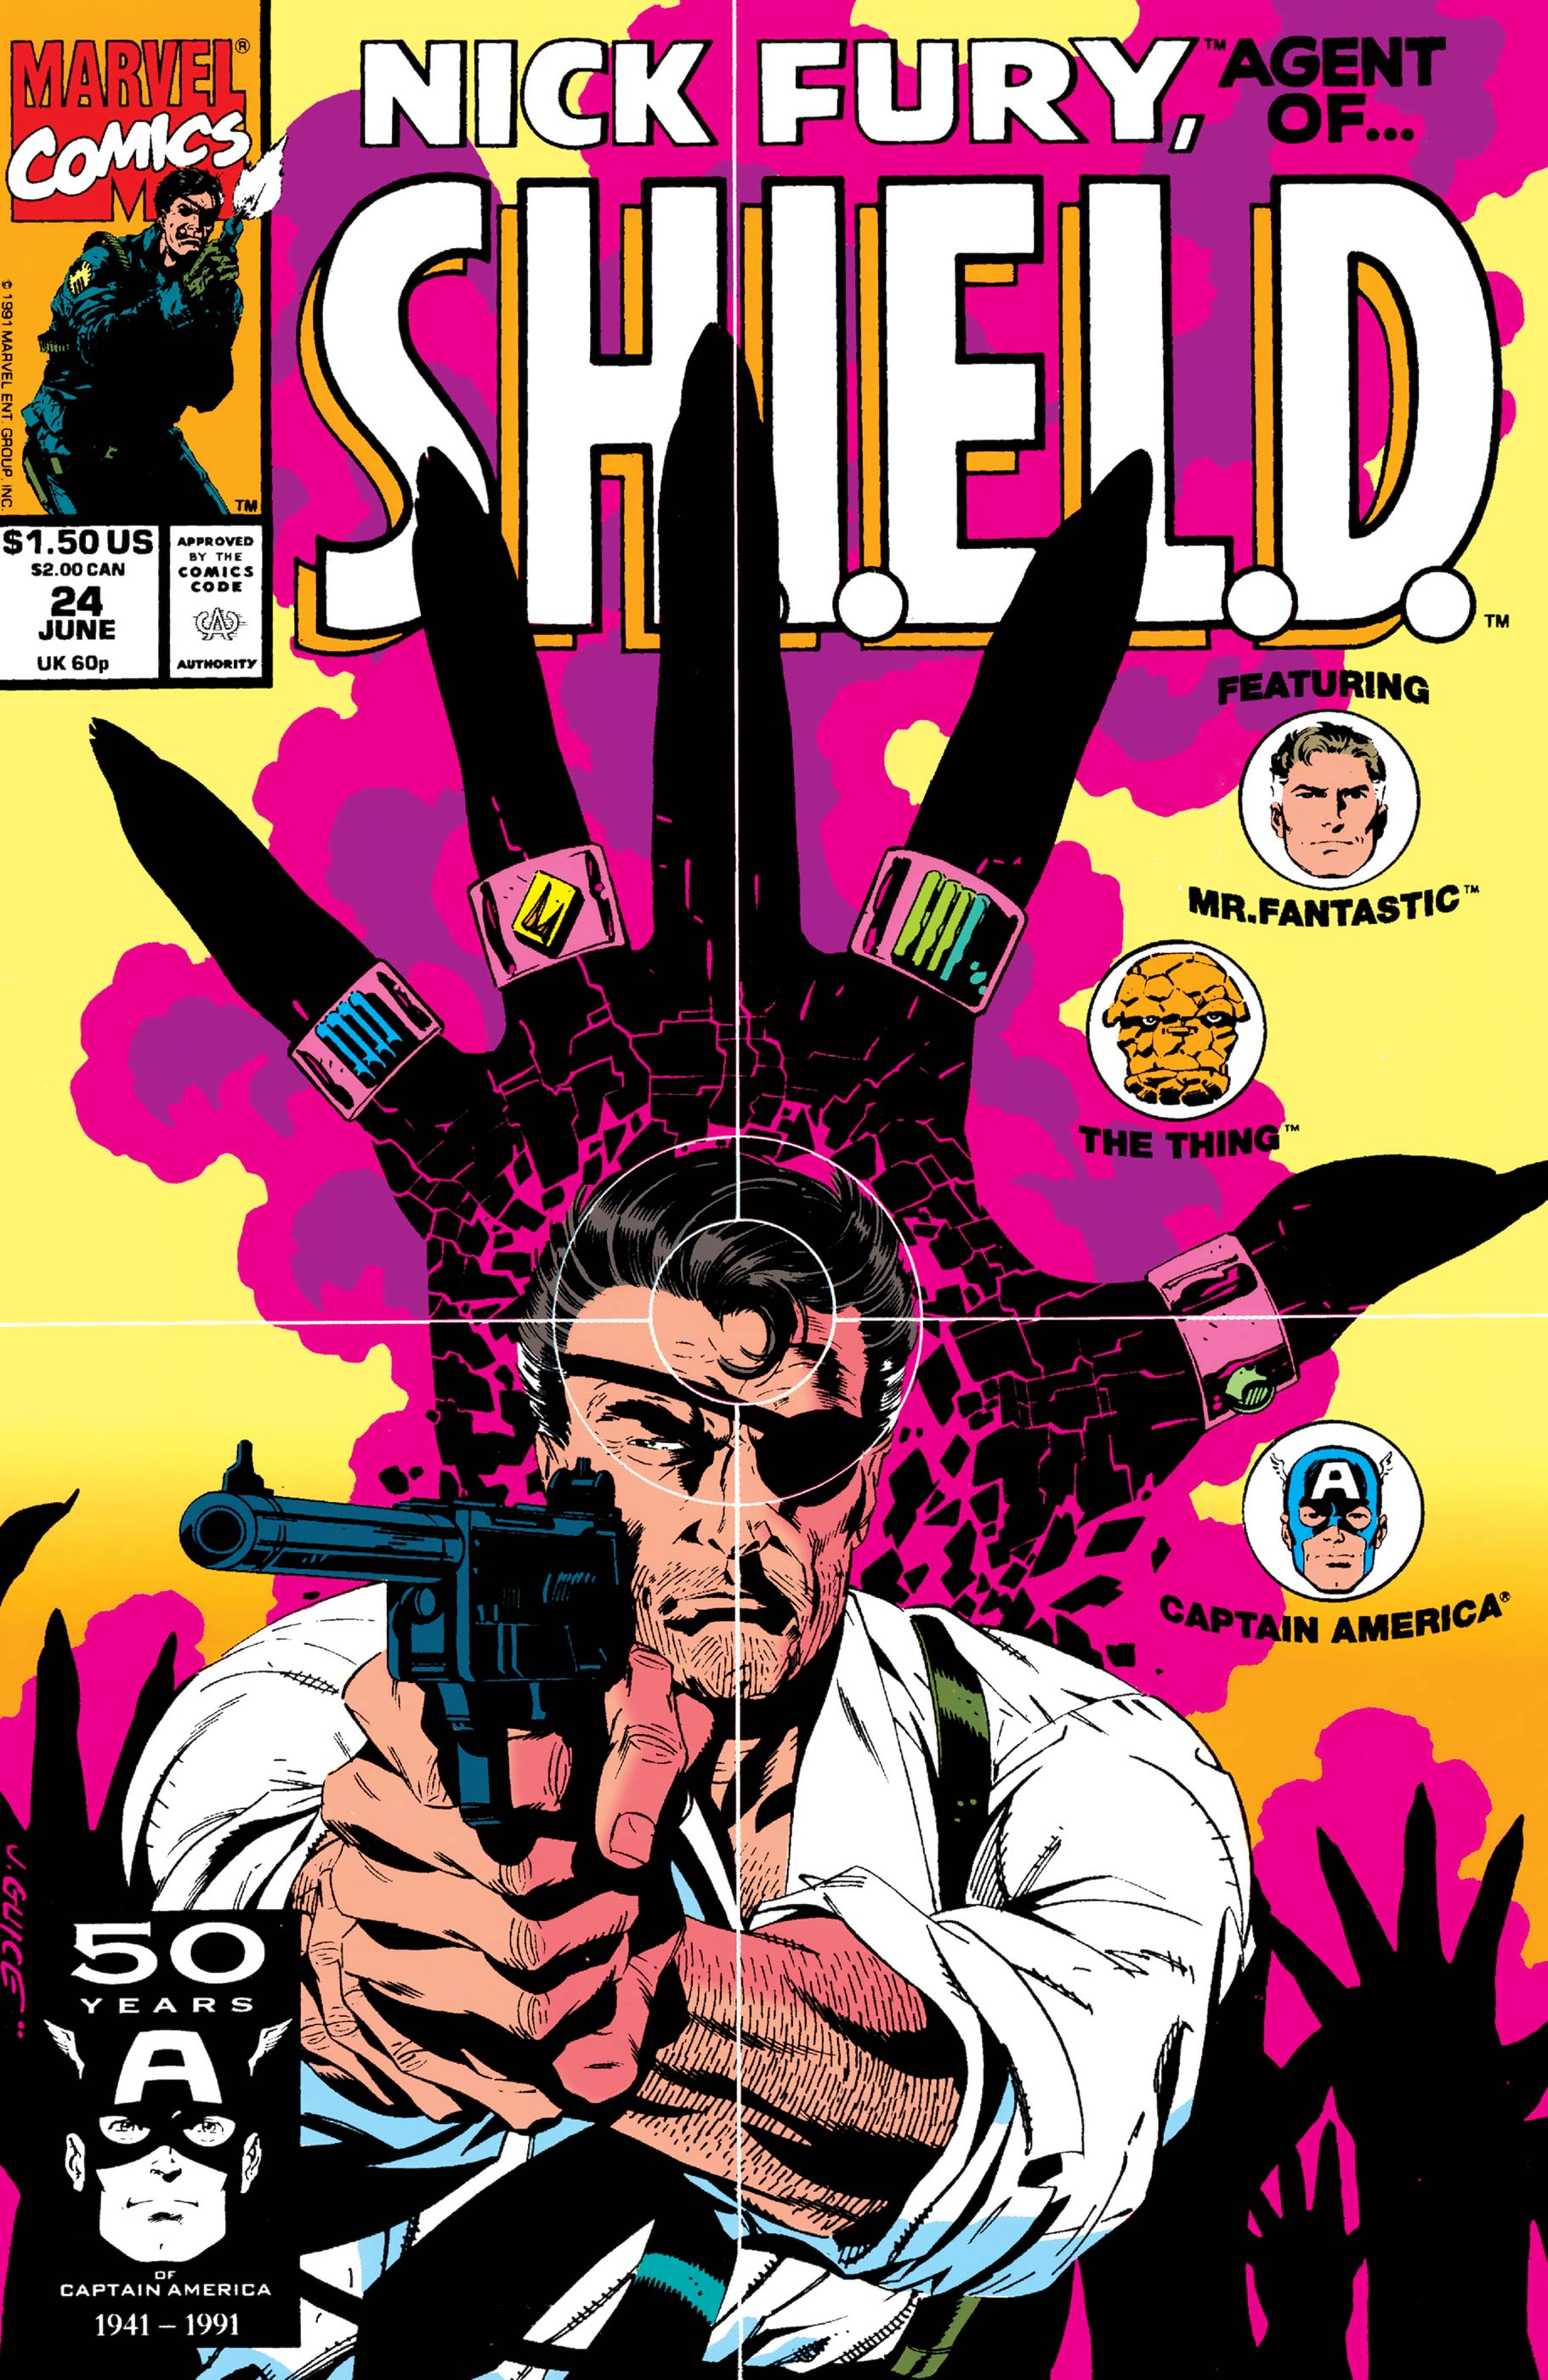 Nick Fury, Agent of S.H.I.E.L.D. (1989) #24